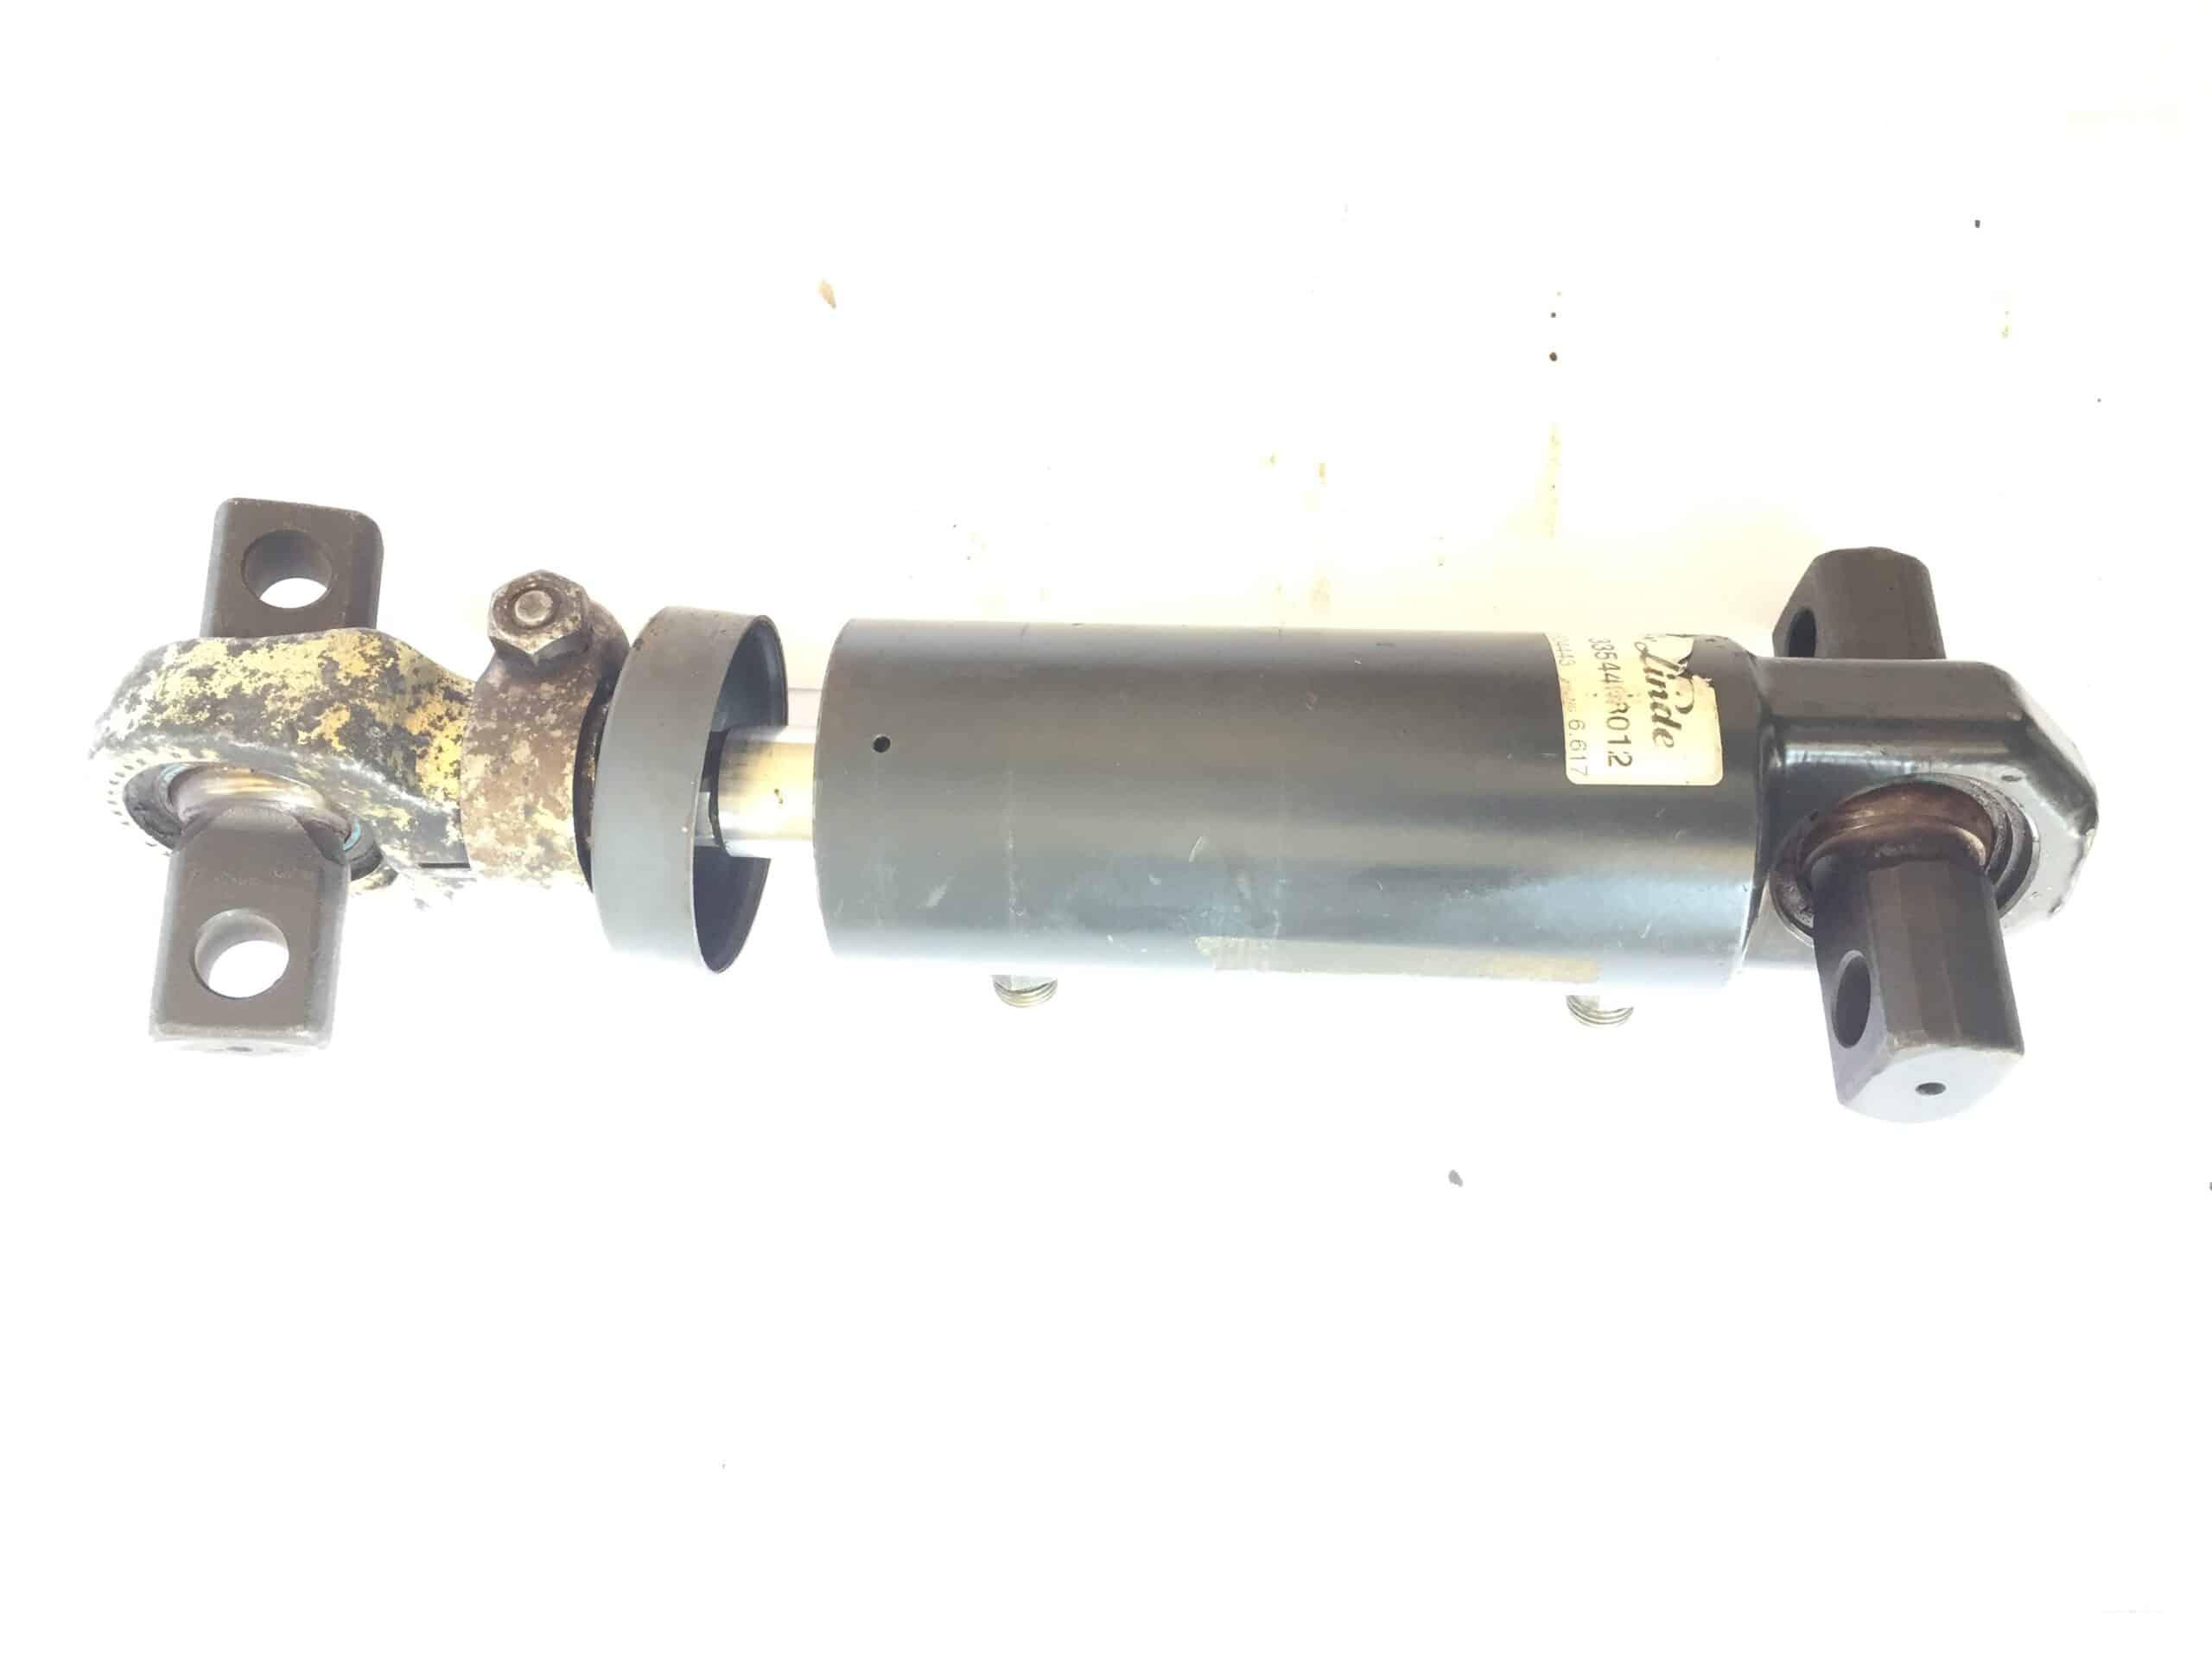   Cylinder Tilt assy.   Fazl-e-Rasheed and Company August 2021